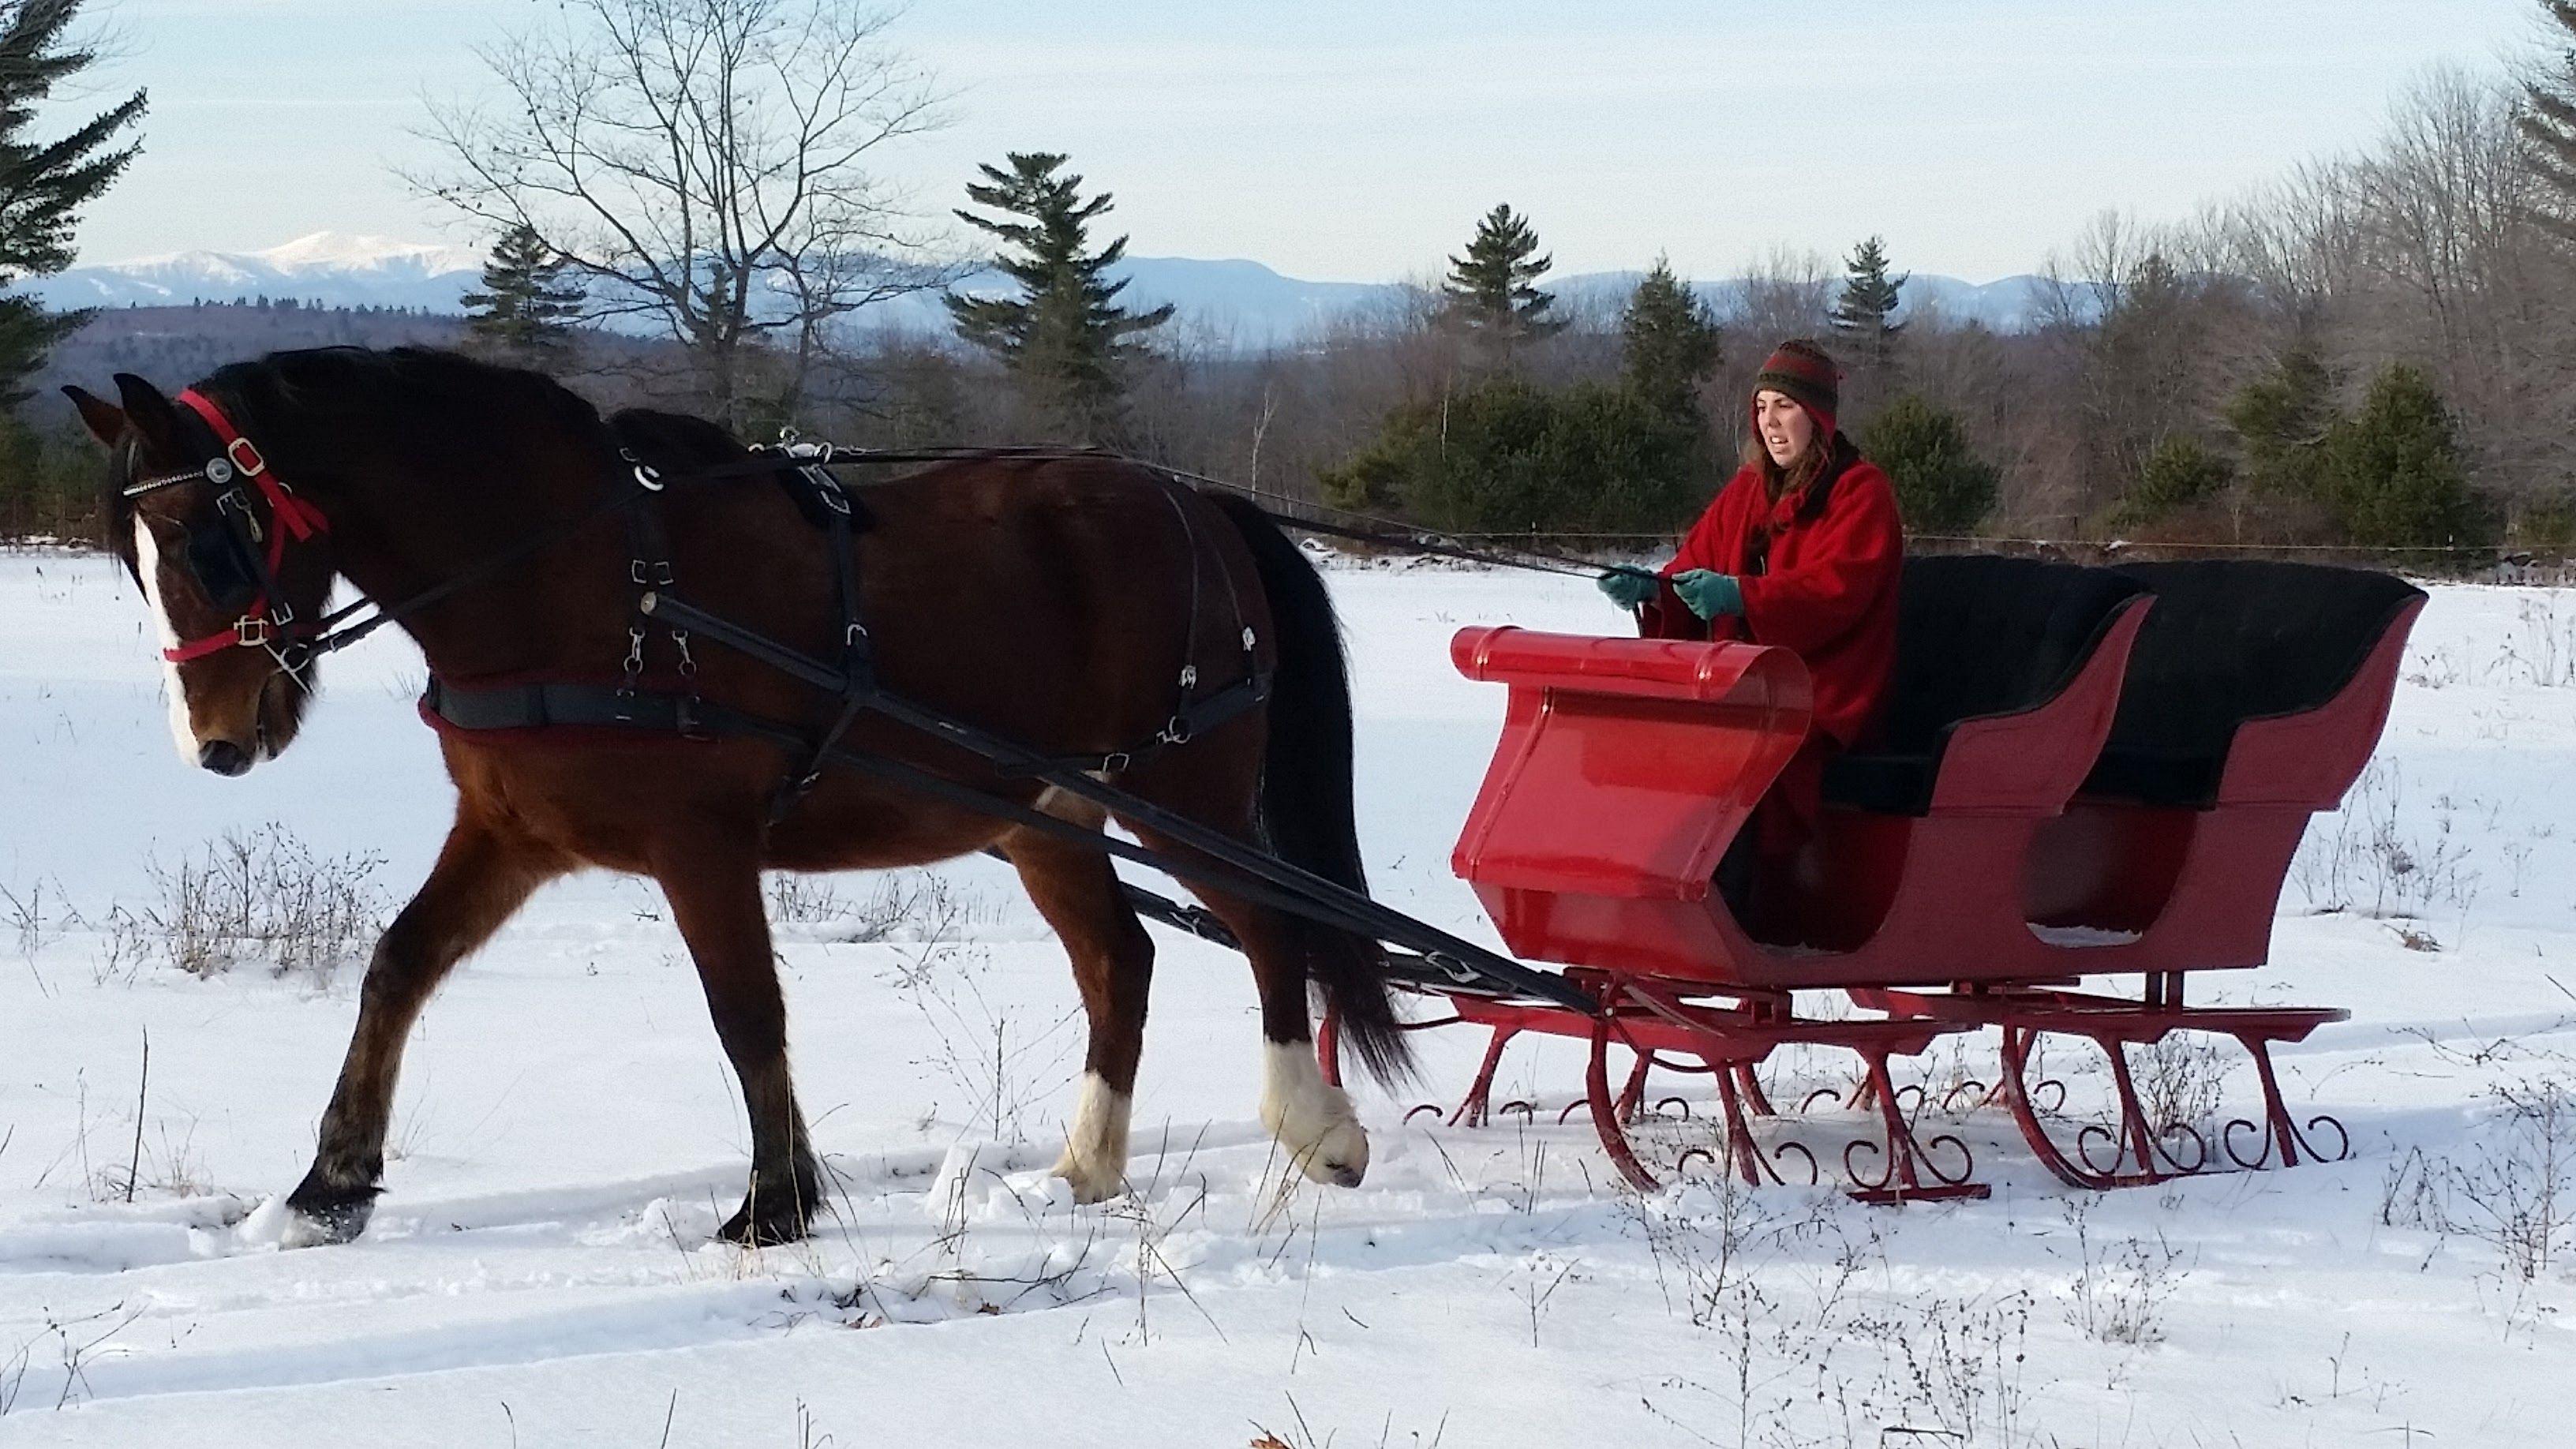 Carousel horse farm best horseback riding in maine